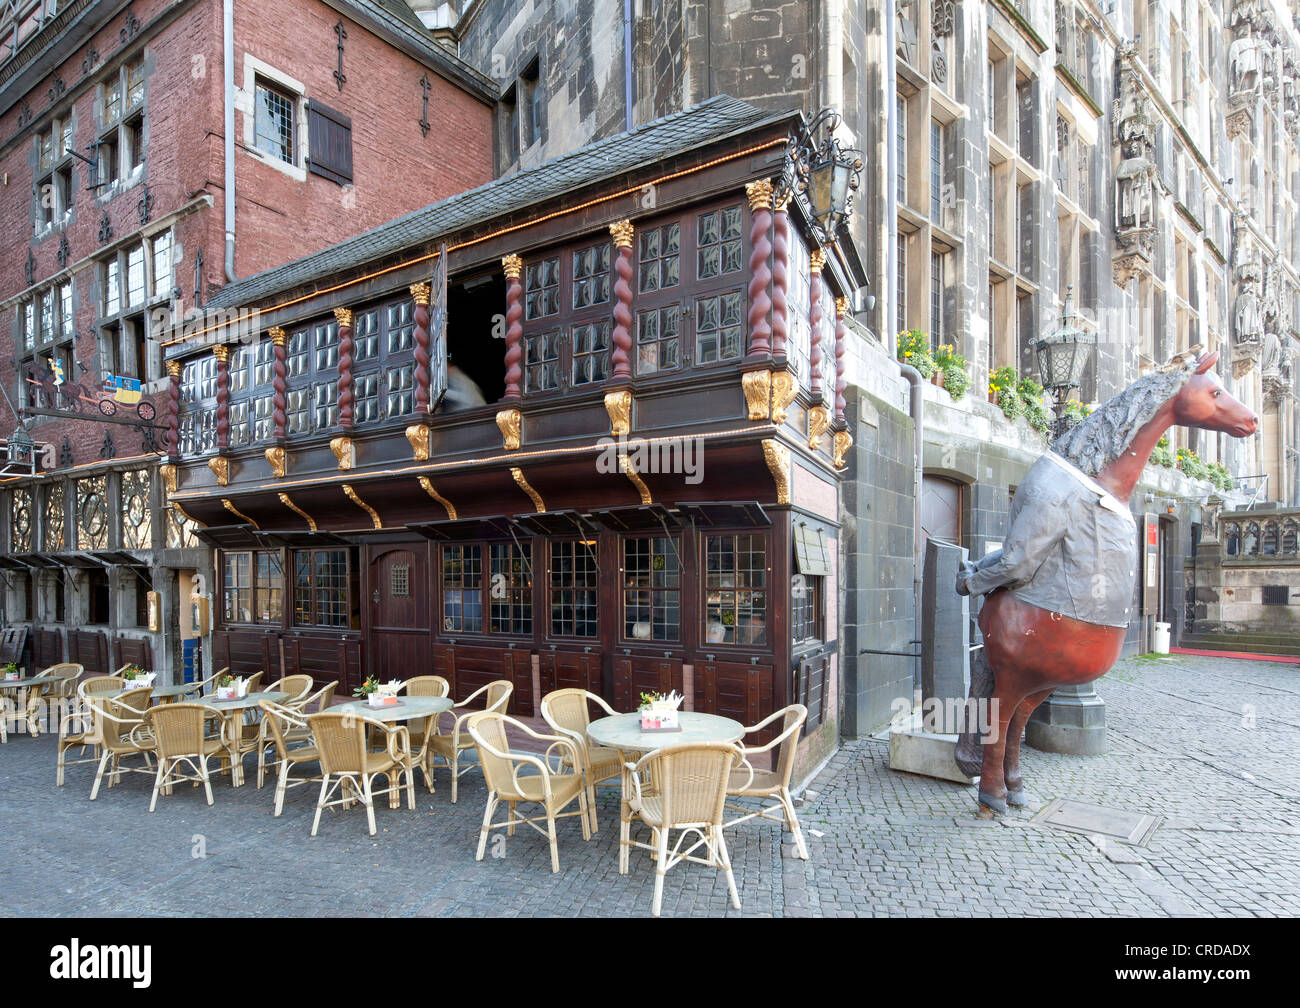 Postwagen, historic restaurant at City Hall, Aachen, North Rhine-Westphalia, Germany, Europe, PublicGround - Stock Image